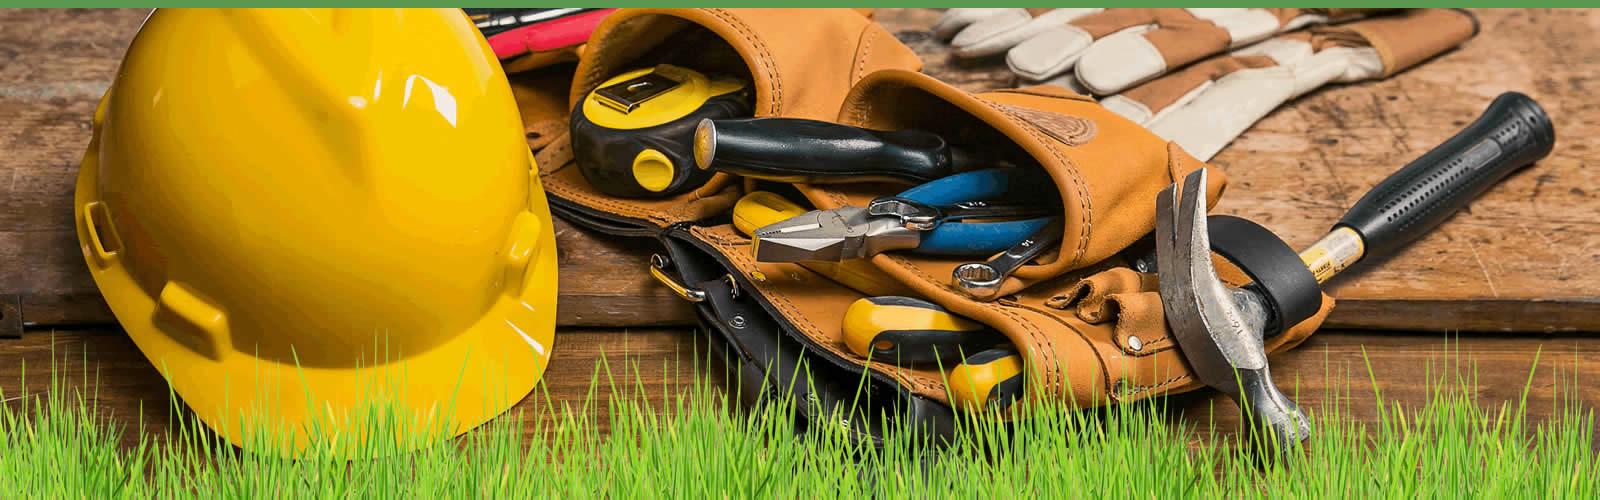 Geelong Home & Garden - Gardening & Handyman Maintenance Services